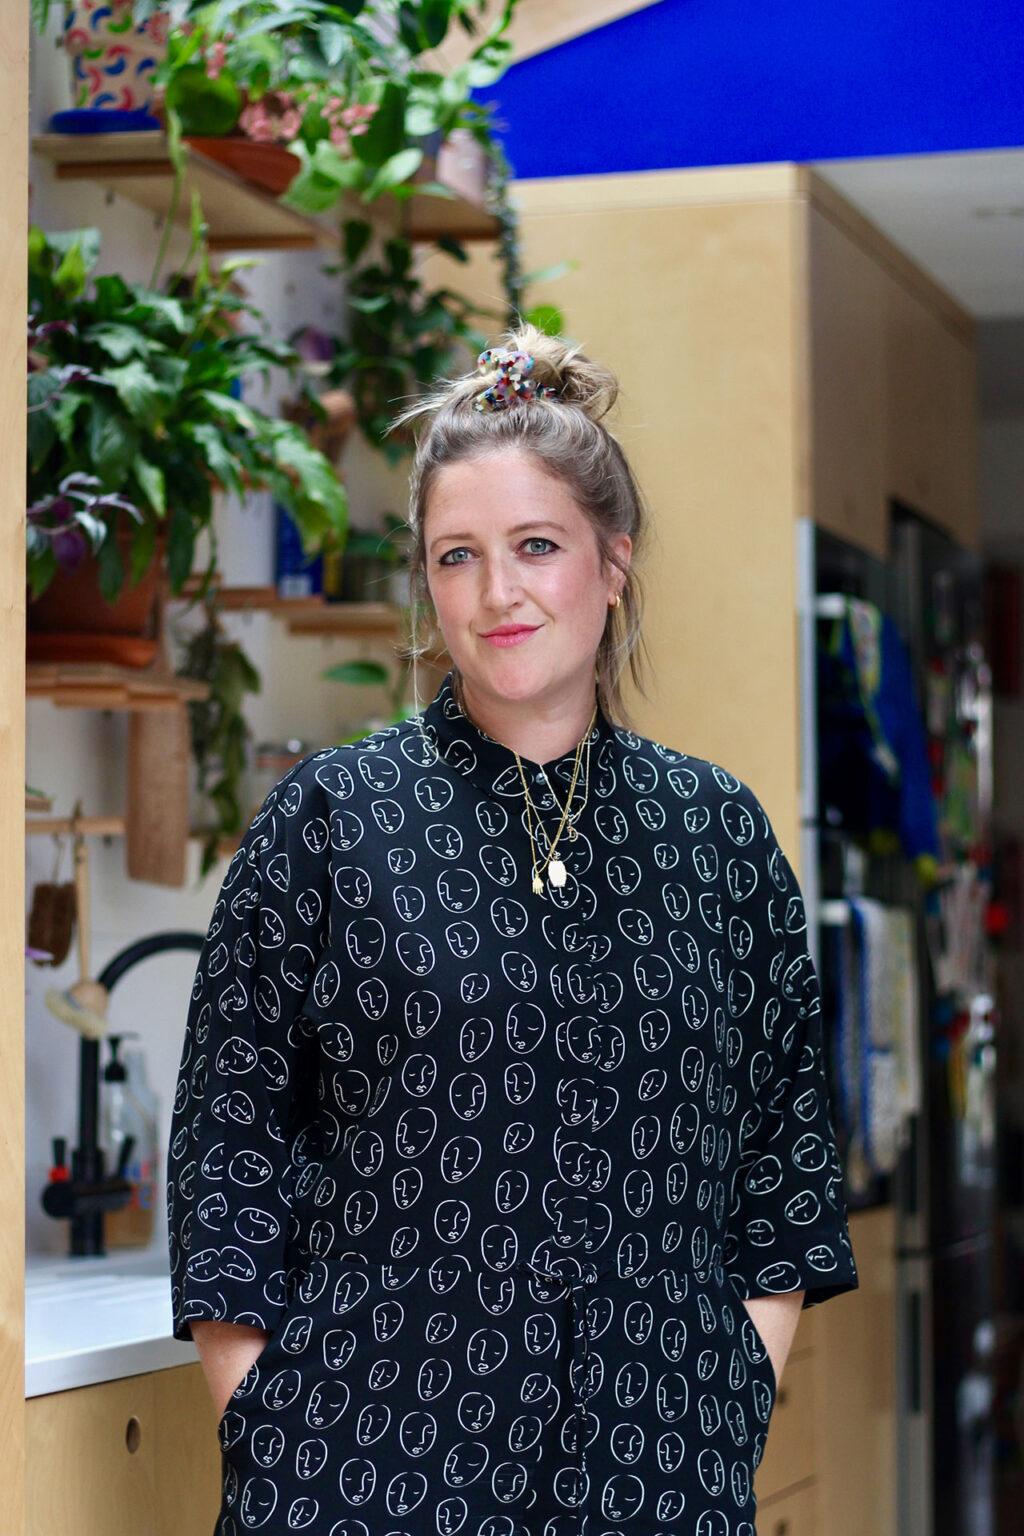 Lauren Davies - Heka London, sensory design studio